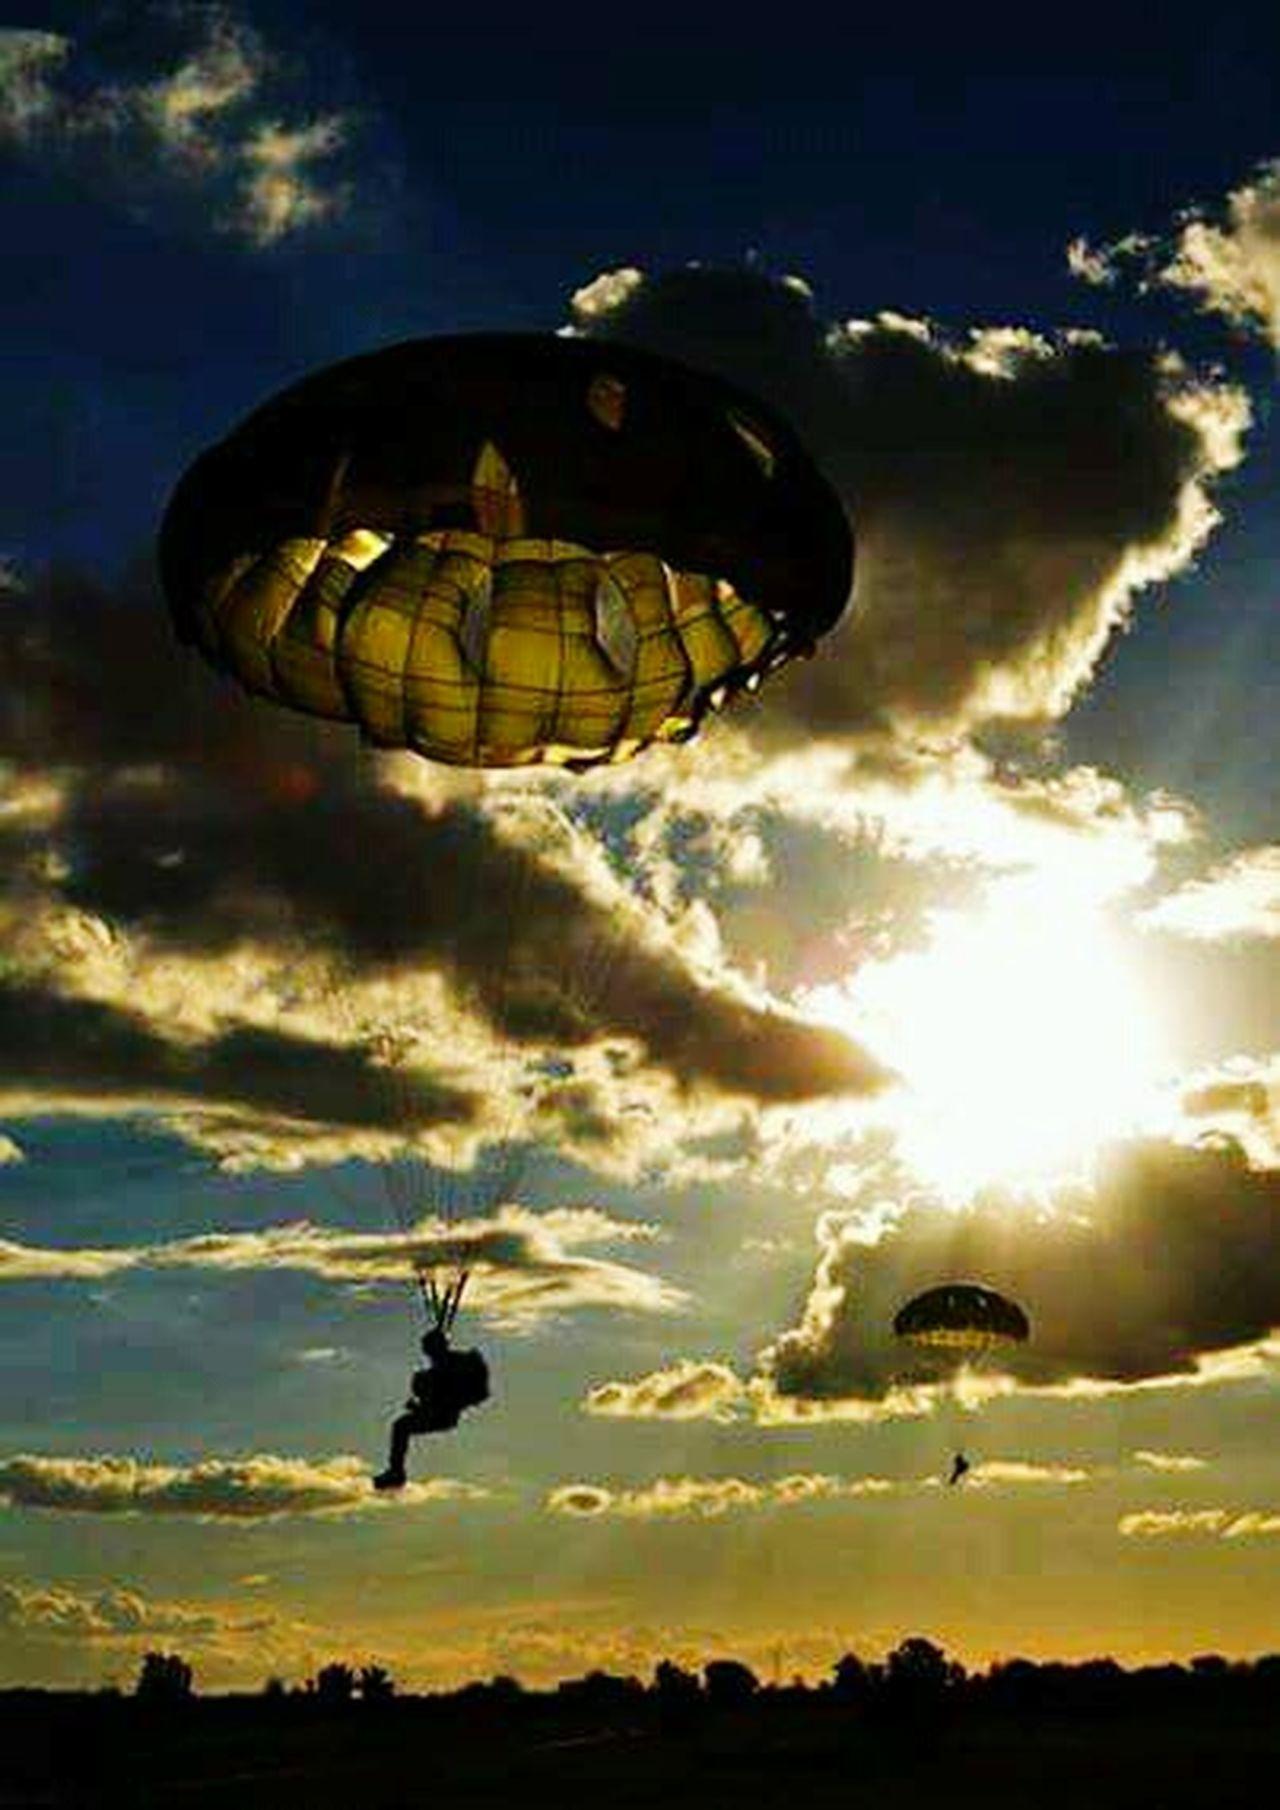 Paratroopers! Hope! Paratroopers Paratrooper Army Soldiers Soldier Brazil PQD Pqdt Paraquedista Errejota  021 Thebest